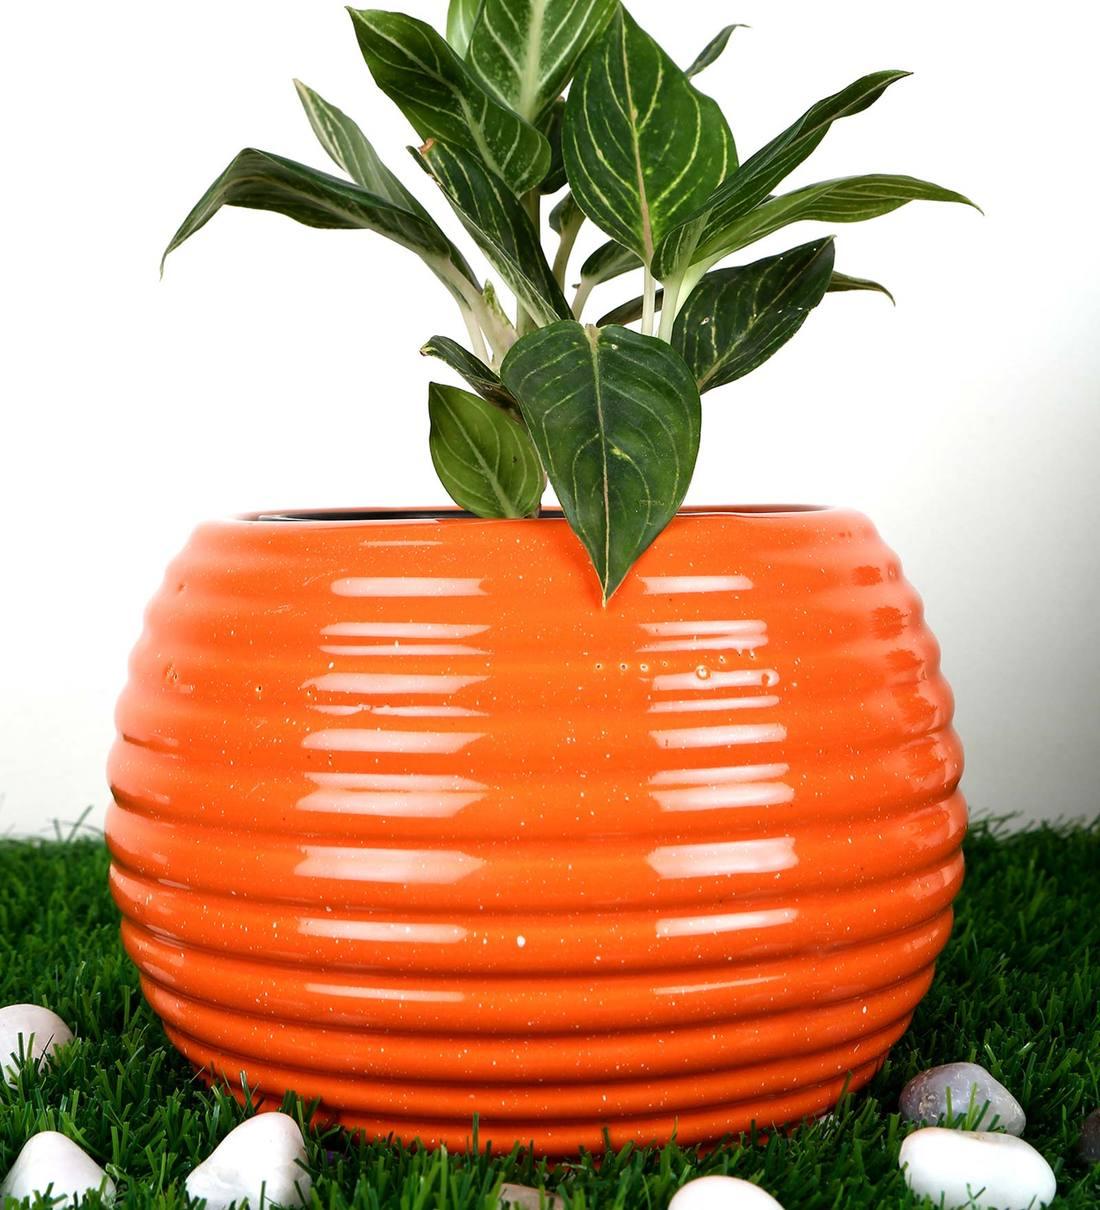 Buy Orange Ceramic Churi Bowl Shape With Straight Lines Medium Planter By Justoriginals Online Floor Planters Pots Planters Home Decor Pepperfry Product